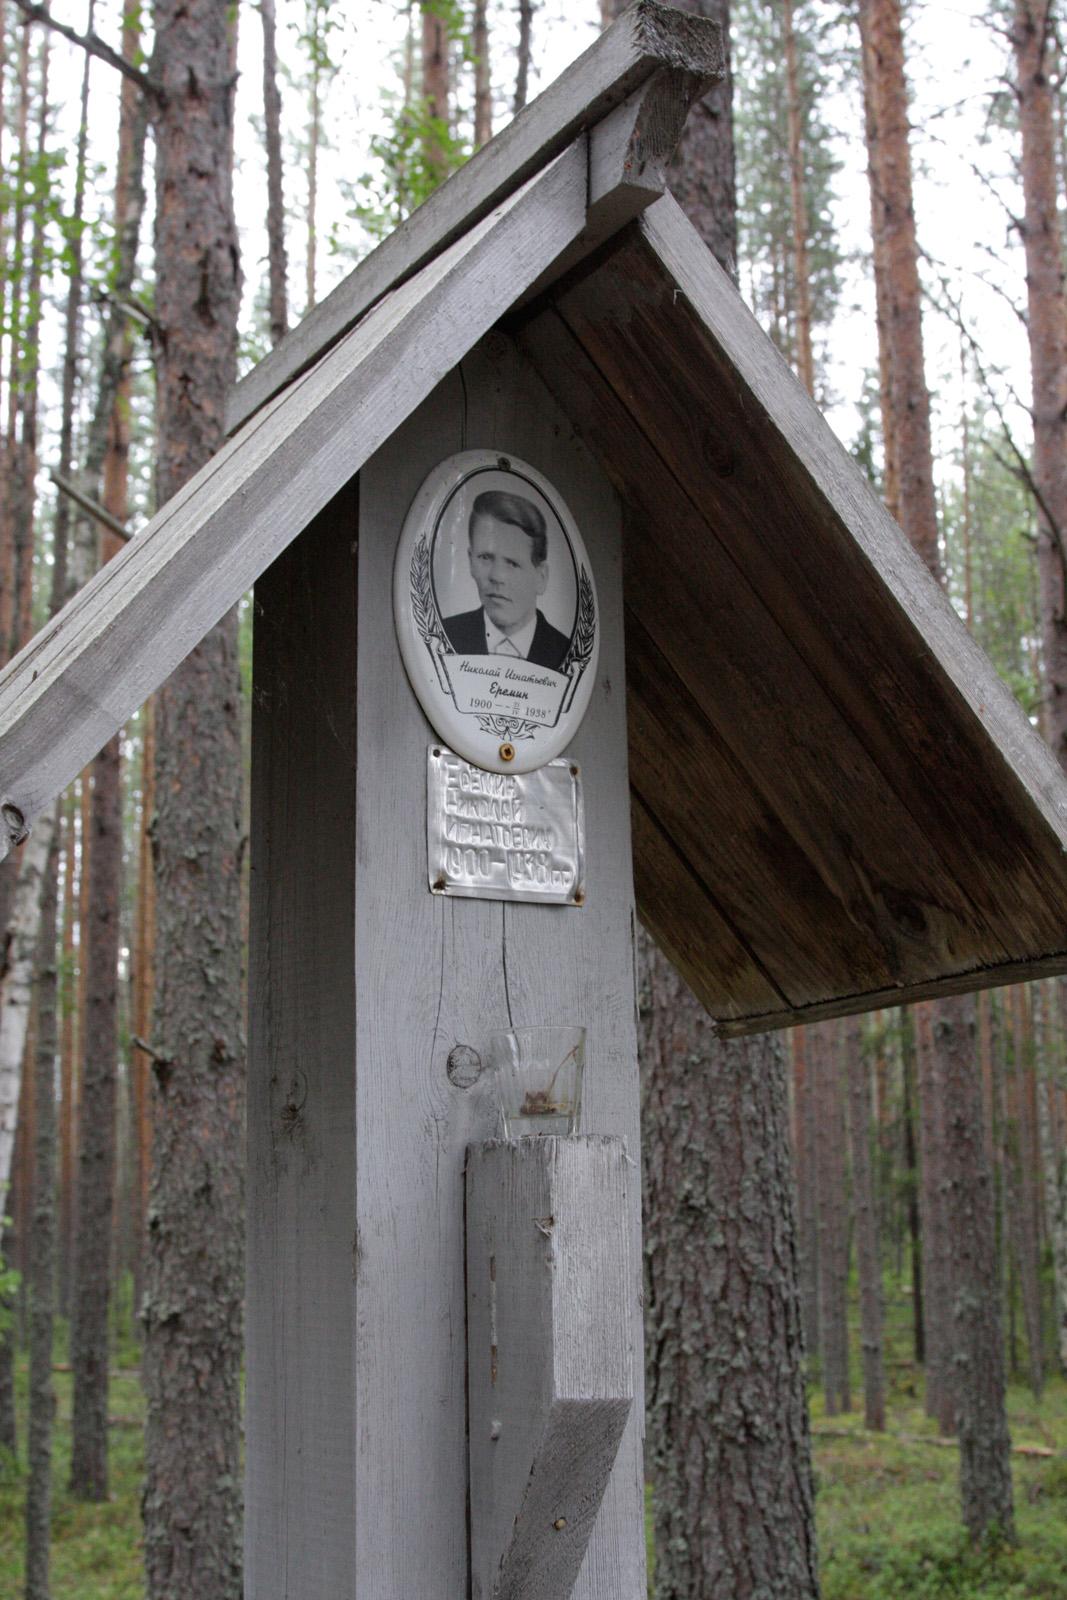 Памятная табличка Н.И. Еремину. Фото 04.08.2011.